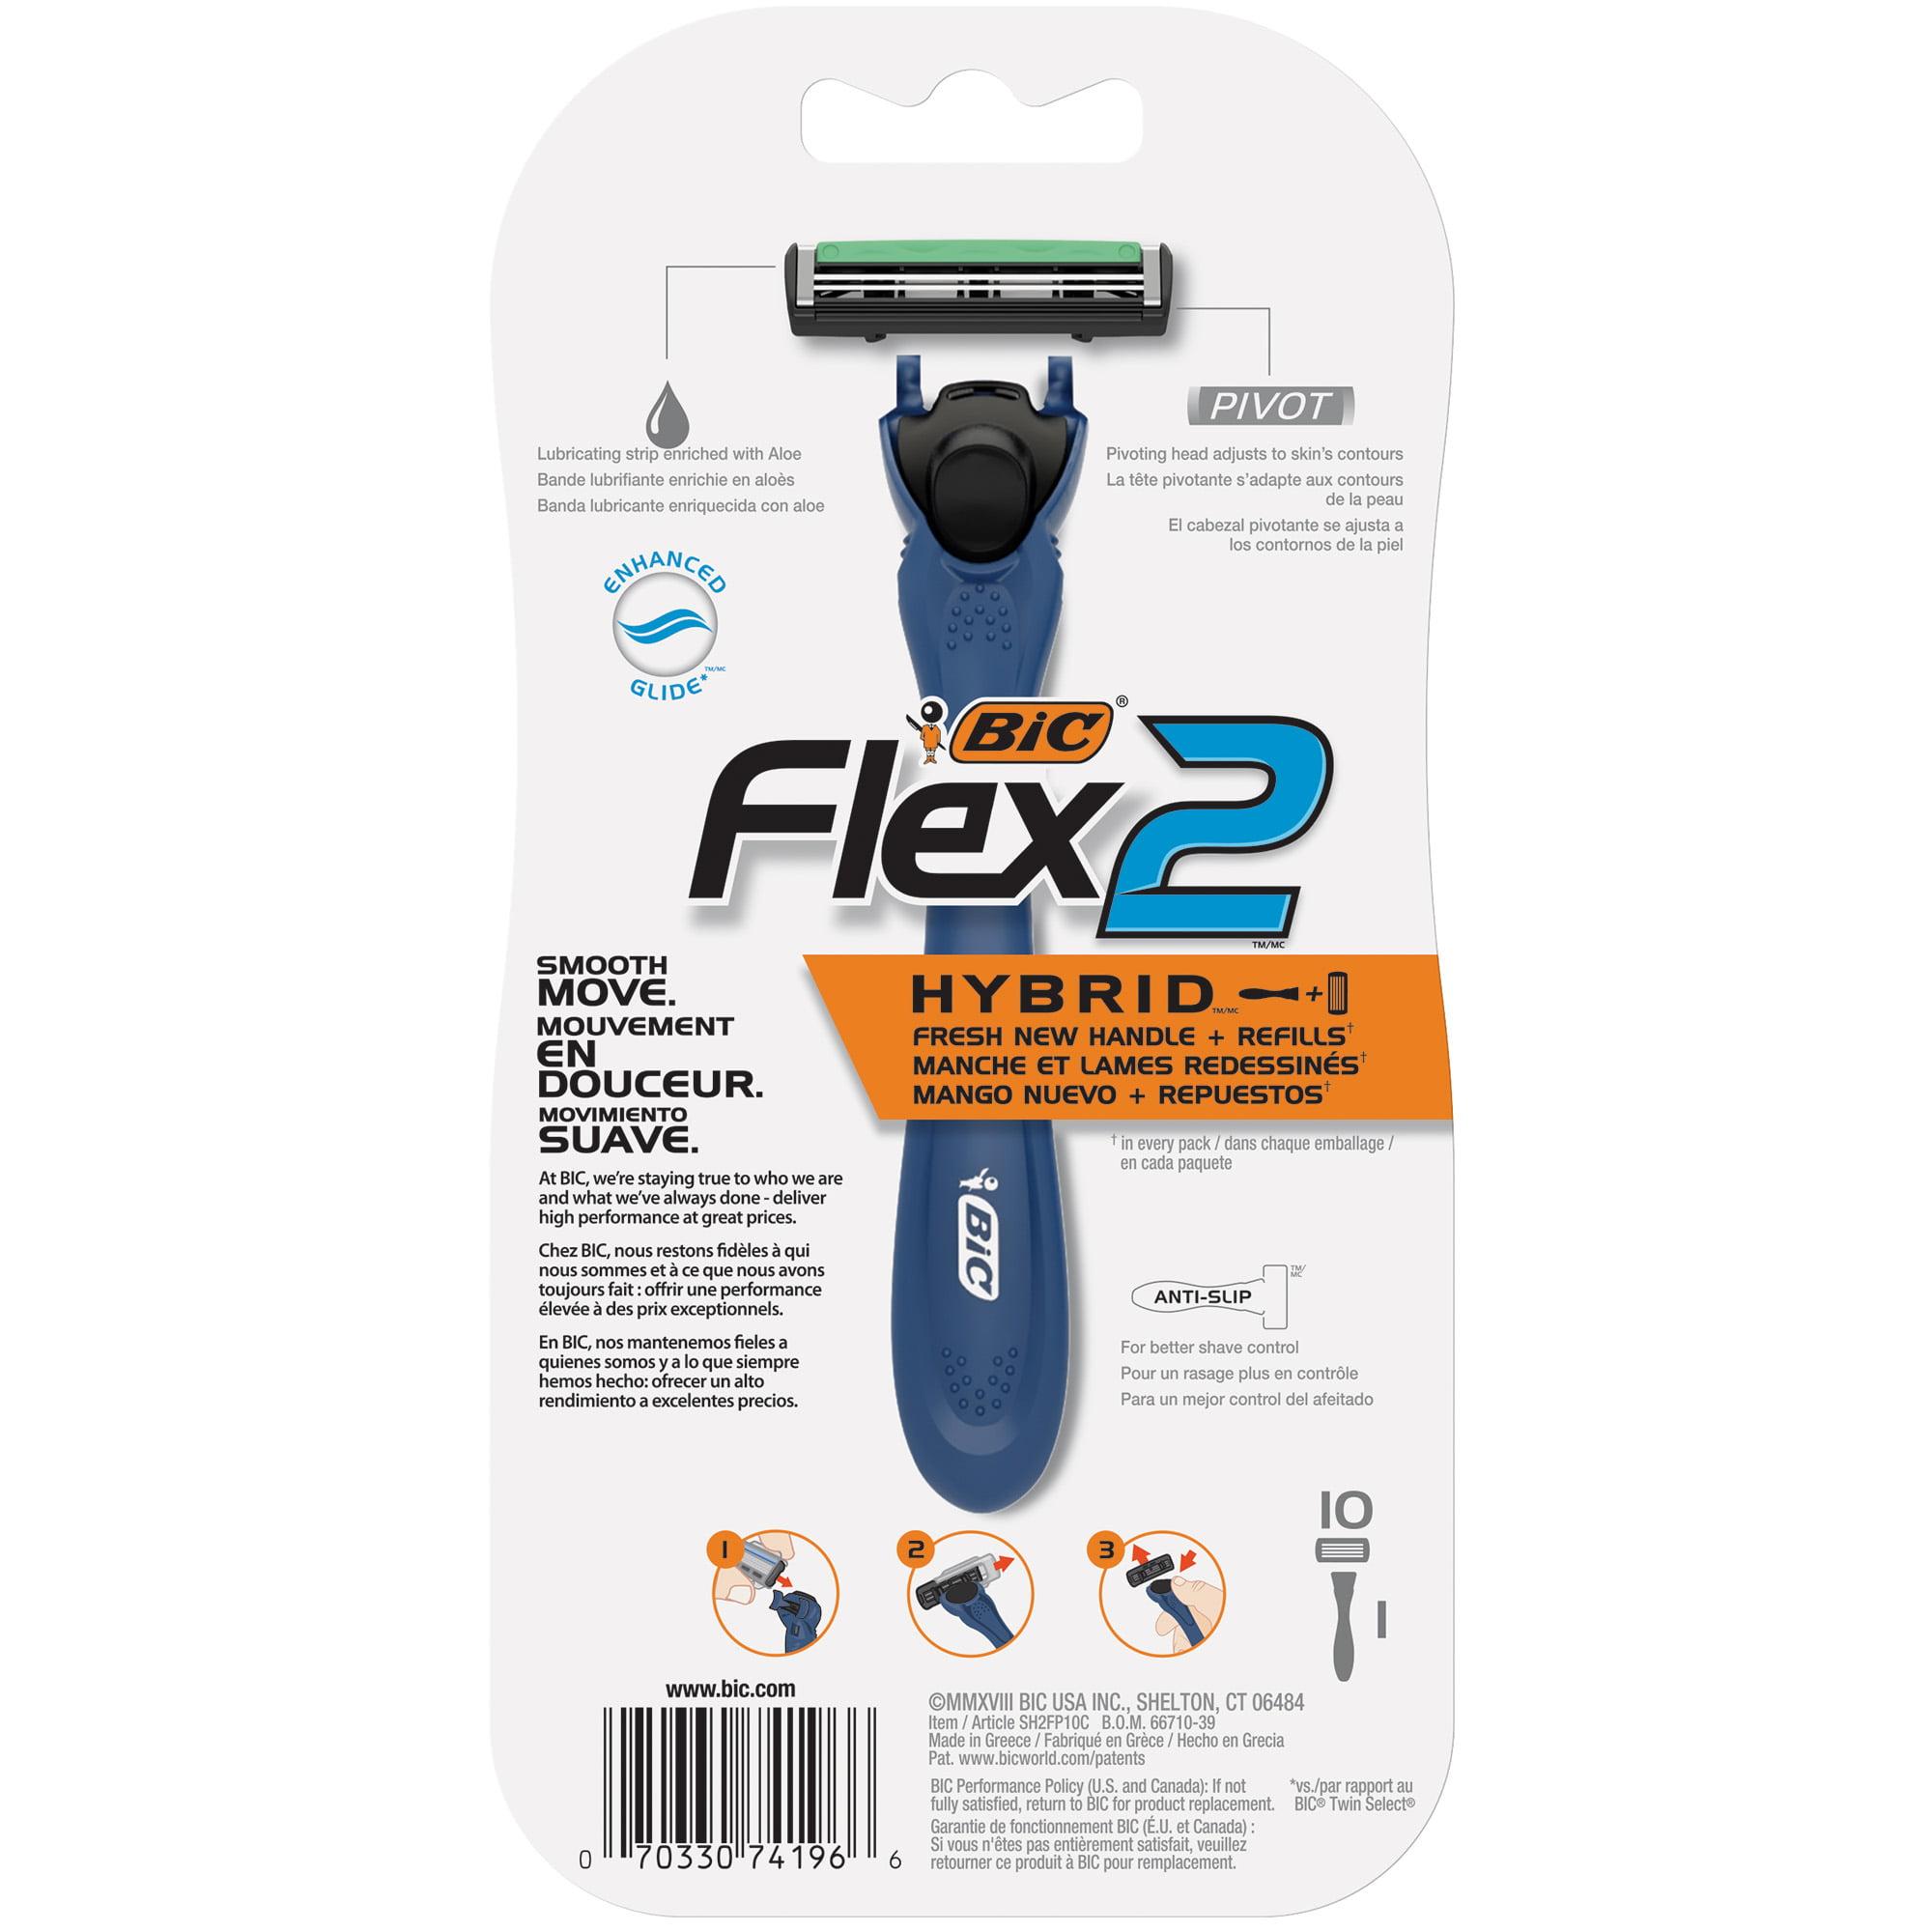 BIC Flex 2 Hybrid Men's Twin Blade Disposable Razor, 1 Handle 10 Cartridges